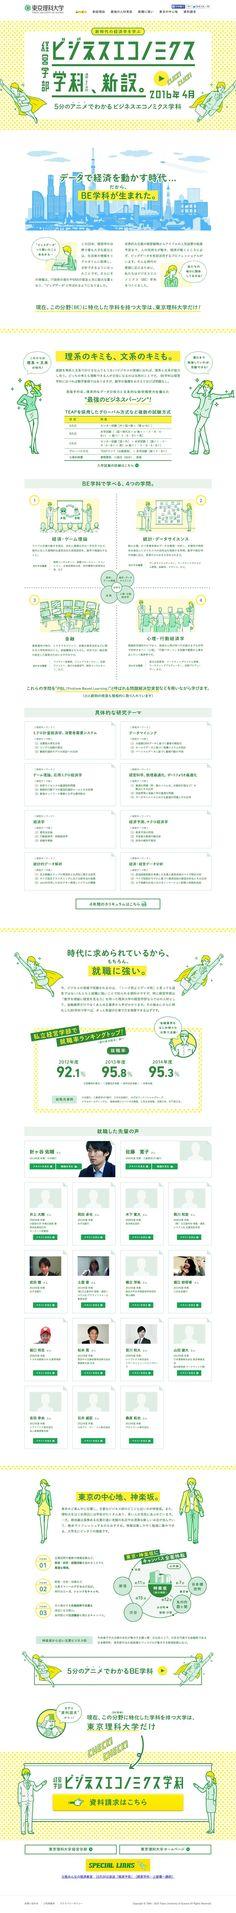 http://www.tus.ac.jp/news/be/